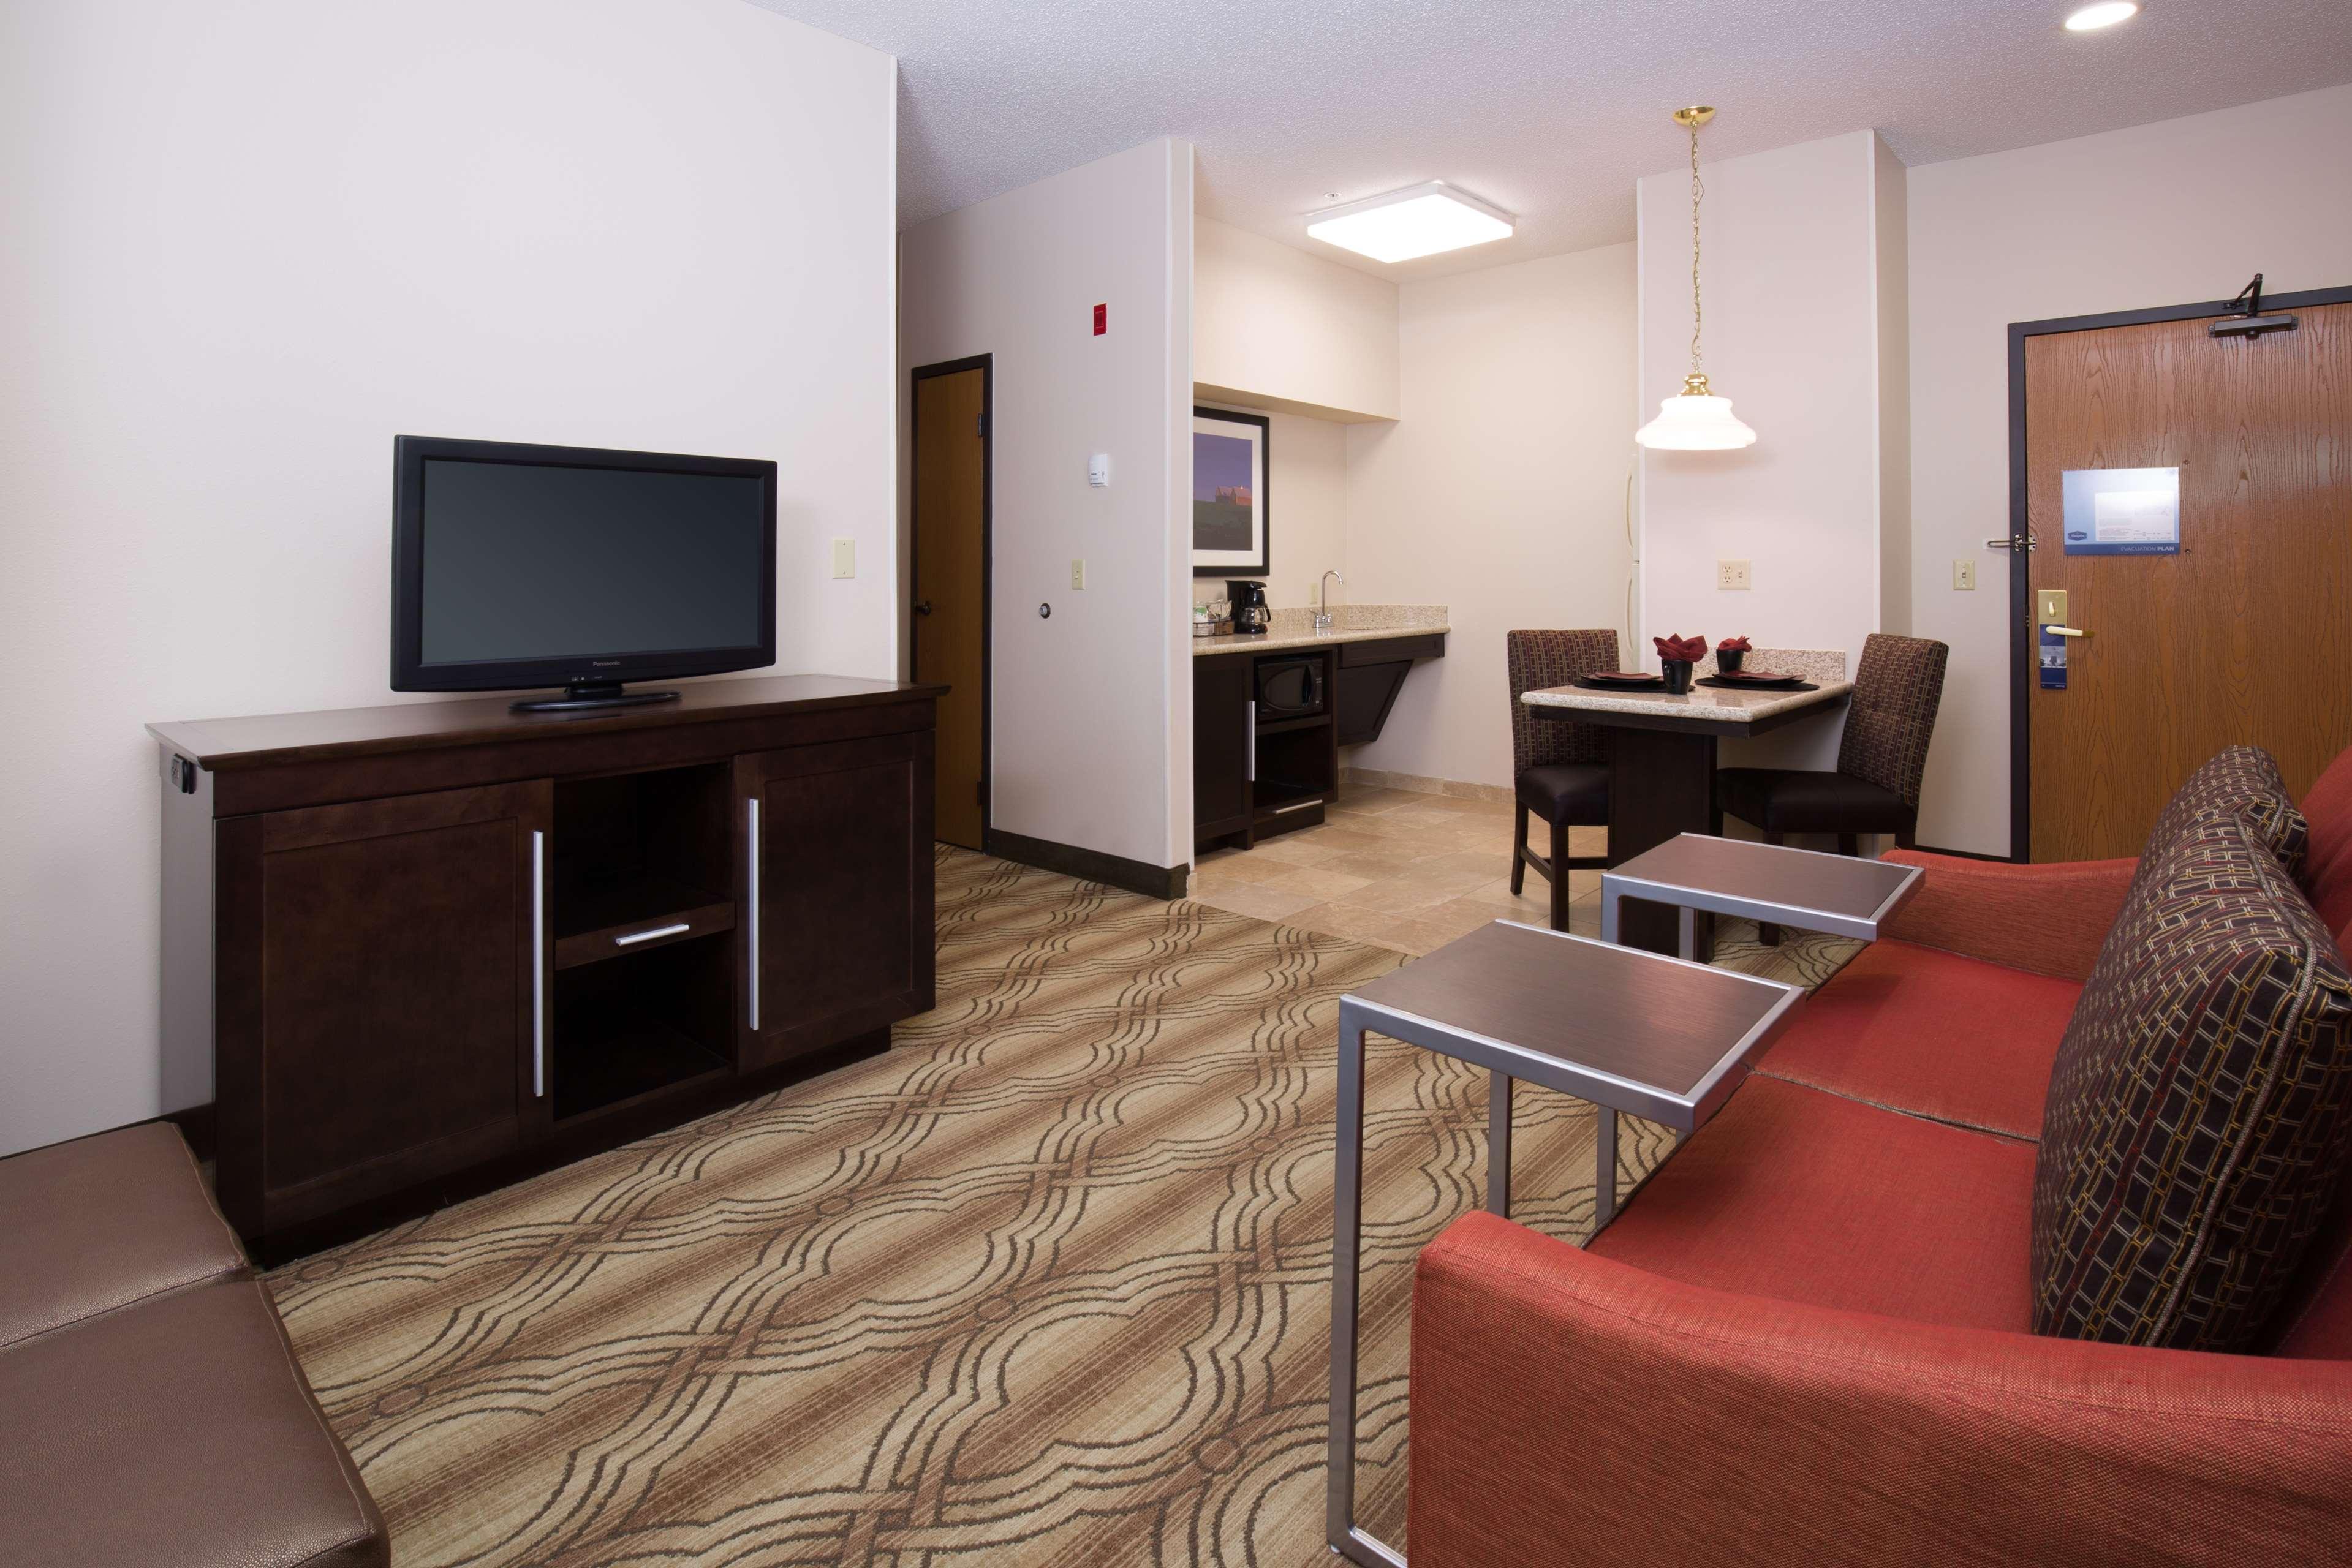 Hampton Inn & Suites Ft. Wayne-North image 16